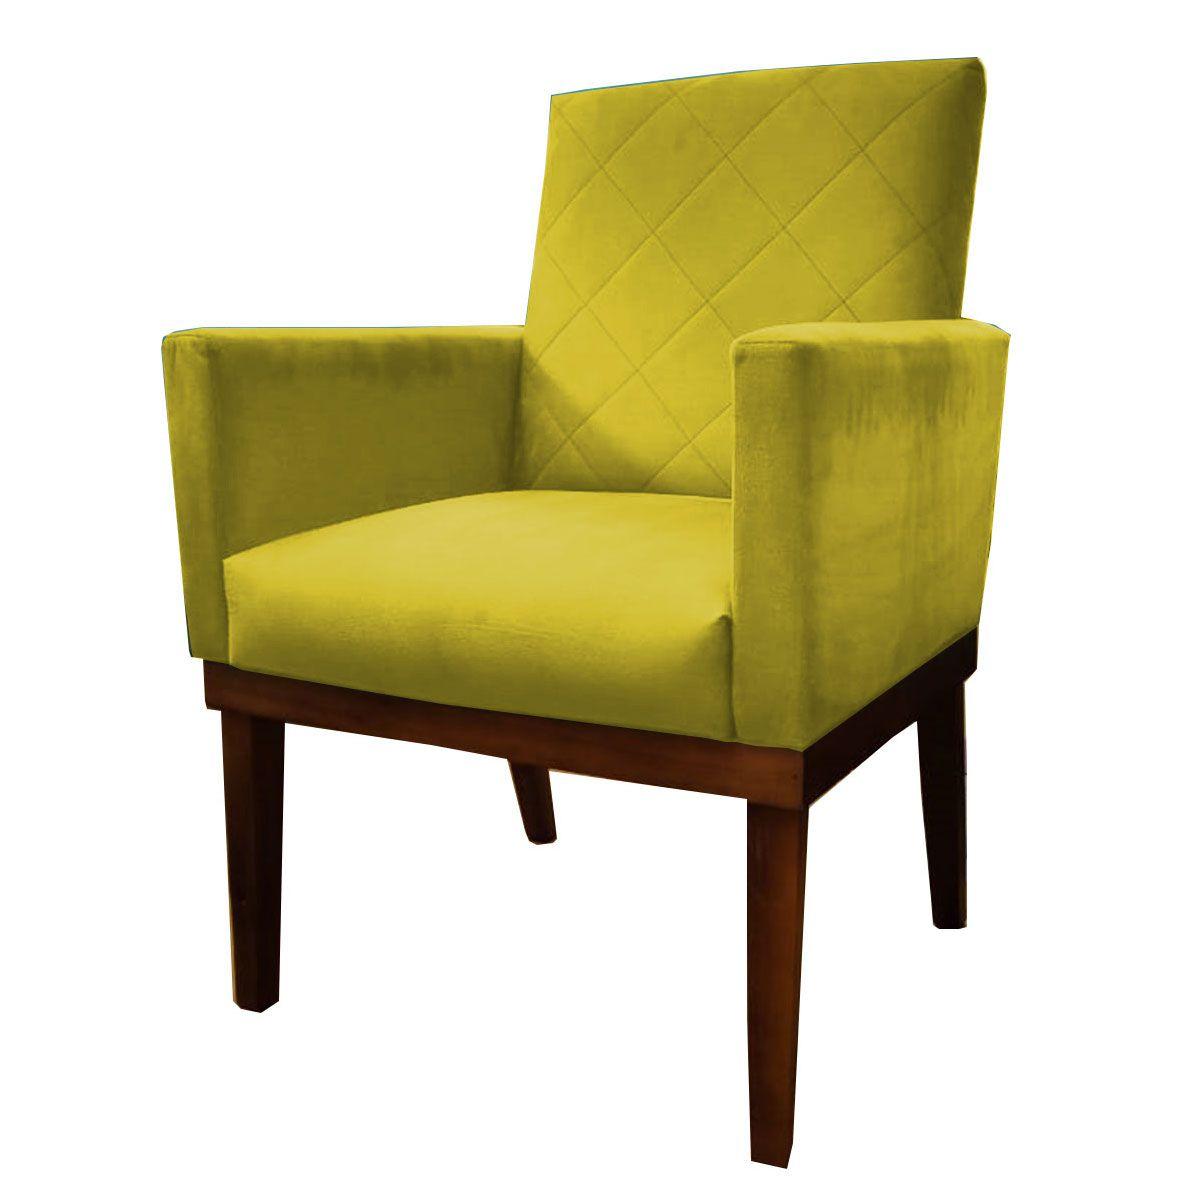 Poltrona Decorativa Beatriz Base Madeira Tecido Amarelo